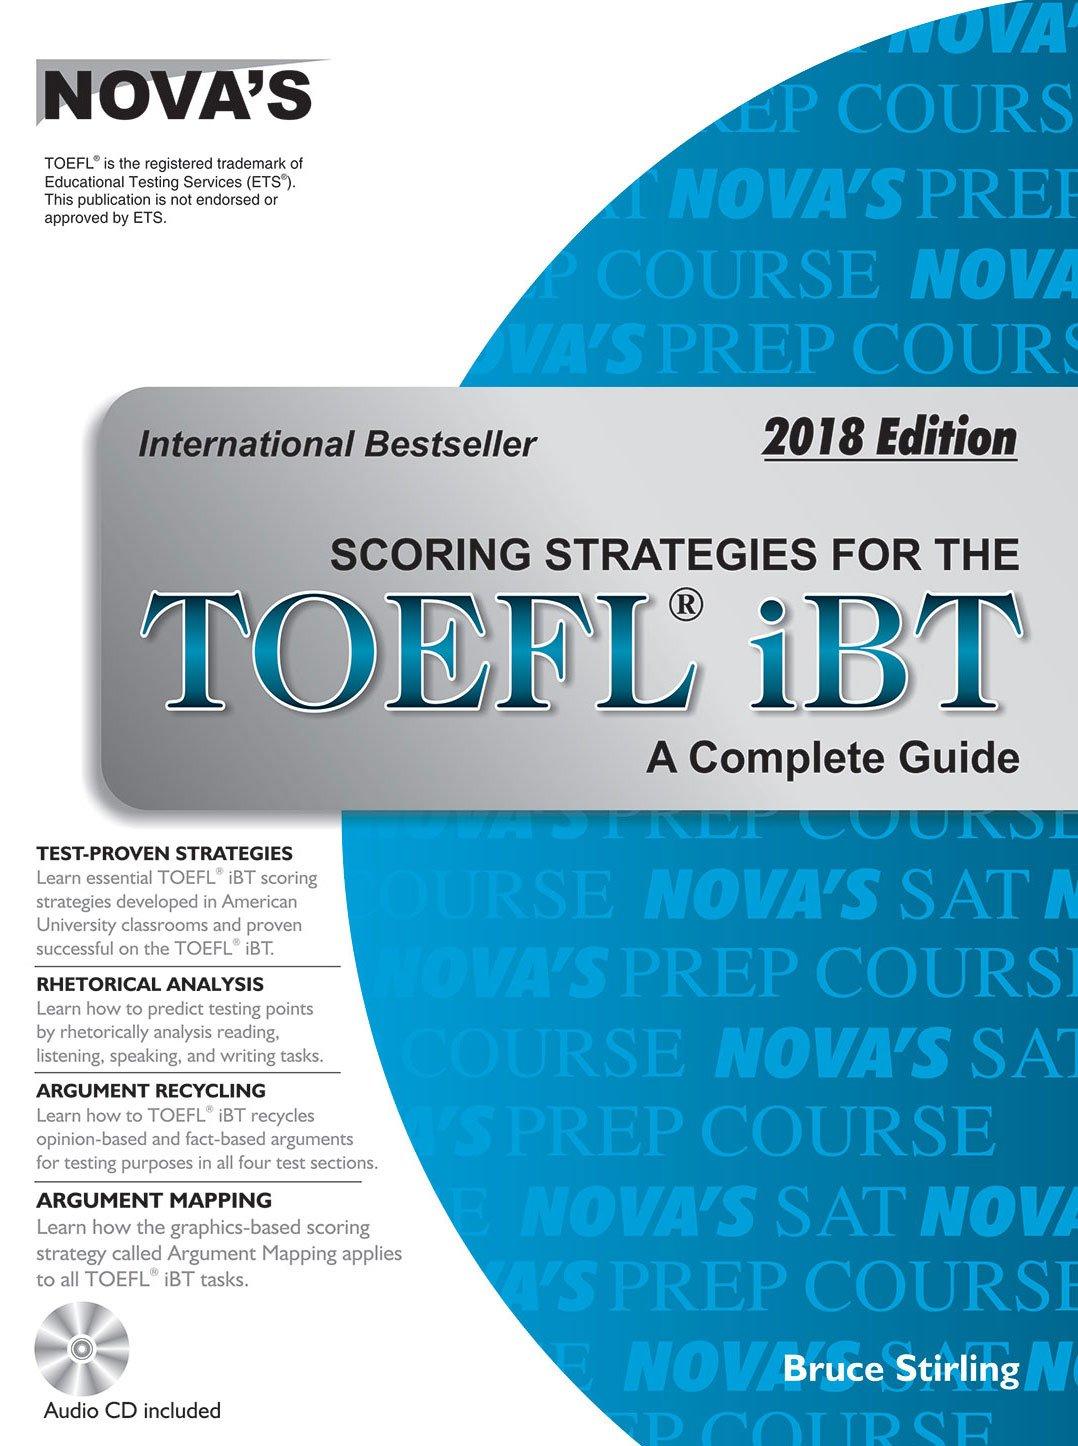 NOVA'S SCORING STRATEGIES FOR THE TOEFL IBT - 2018 EDITION